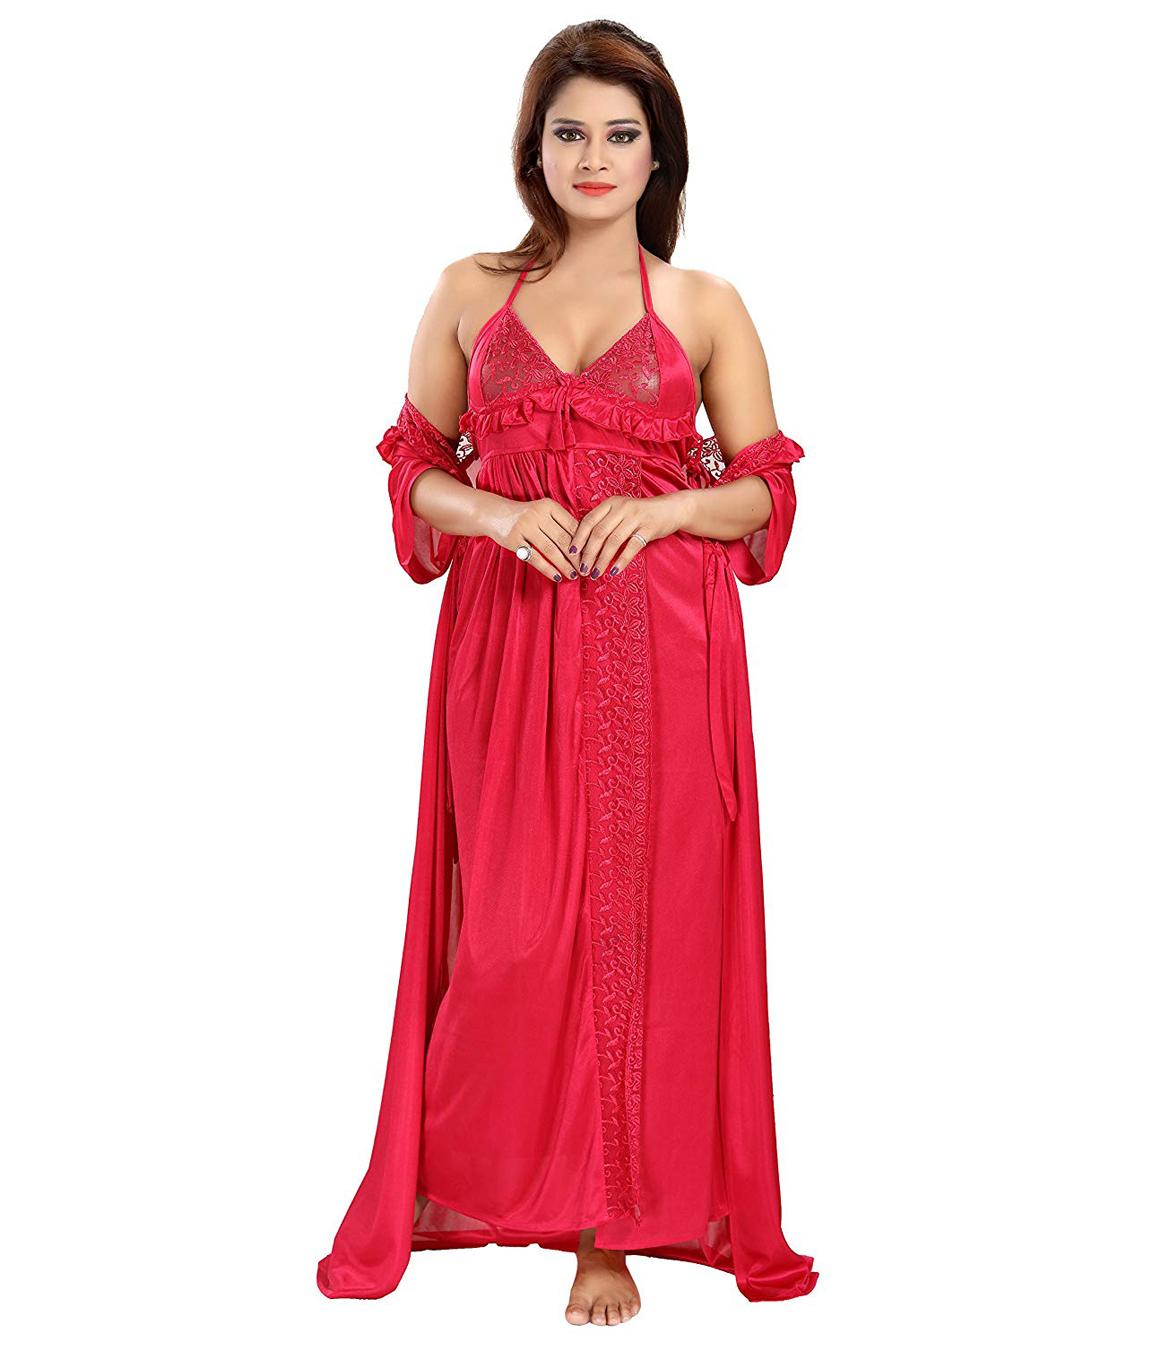 Romaisa Women`s Satin Nightwear Set of 6 Pcs Nighty, Wrap Gown, Top, Capri, Bra & Thong (Size - Small, Medium, Large) (Pack of 6) COLOUR : CRIMSON RED